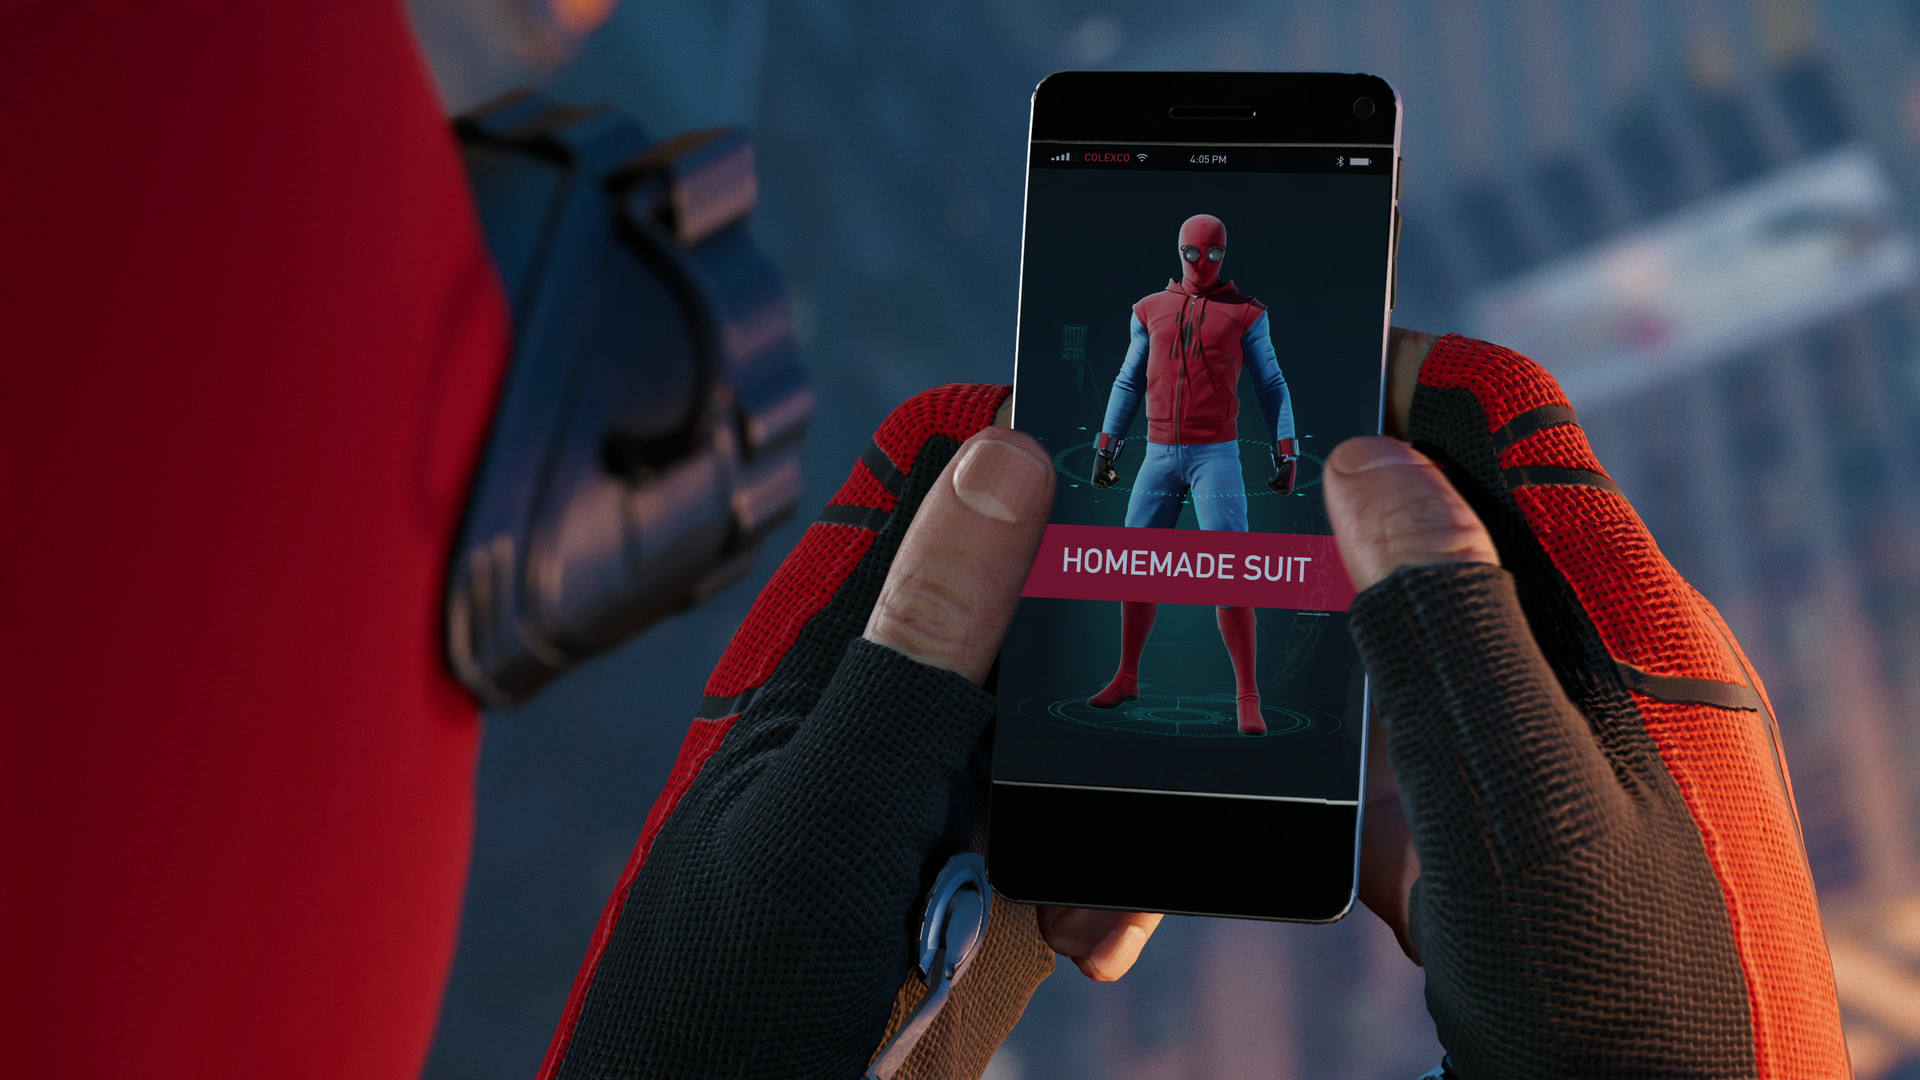 Spider Man Homecoming homemade